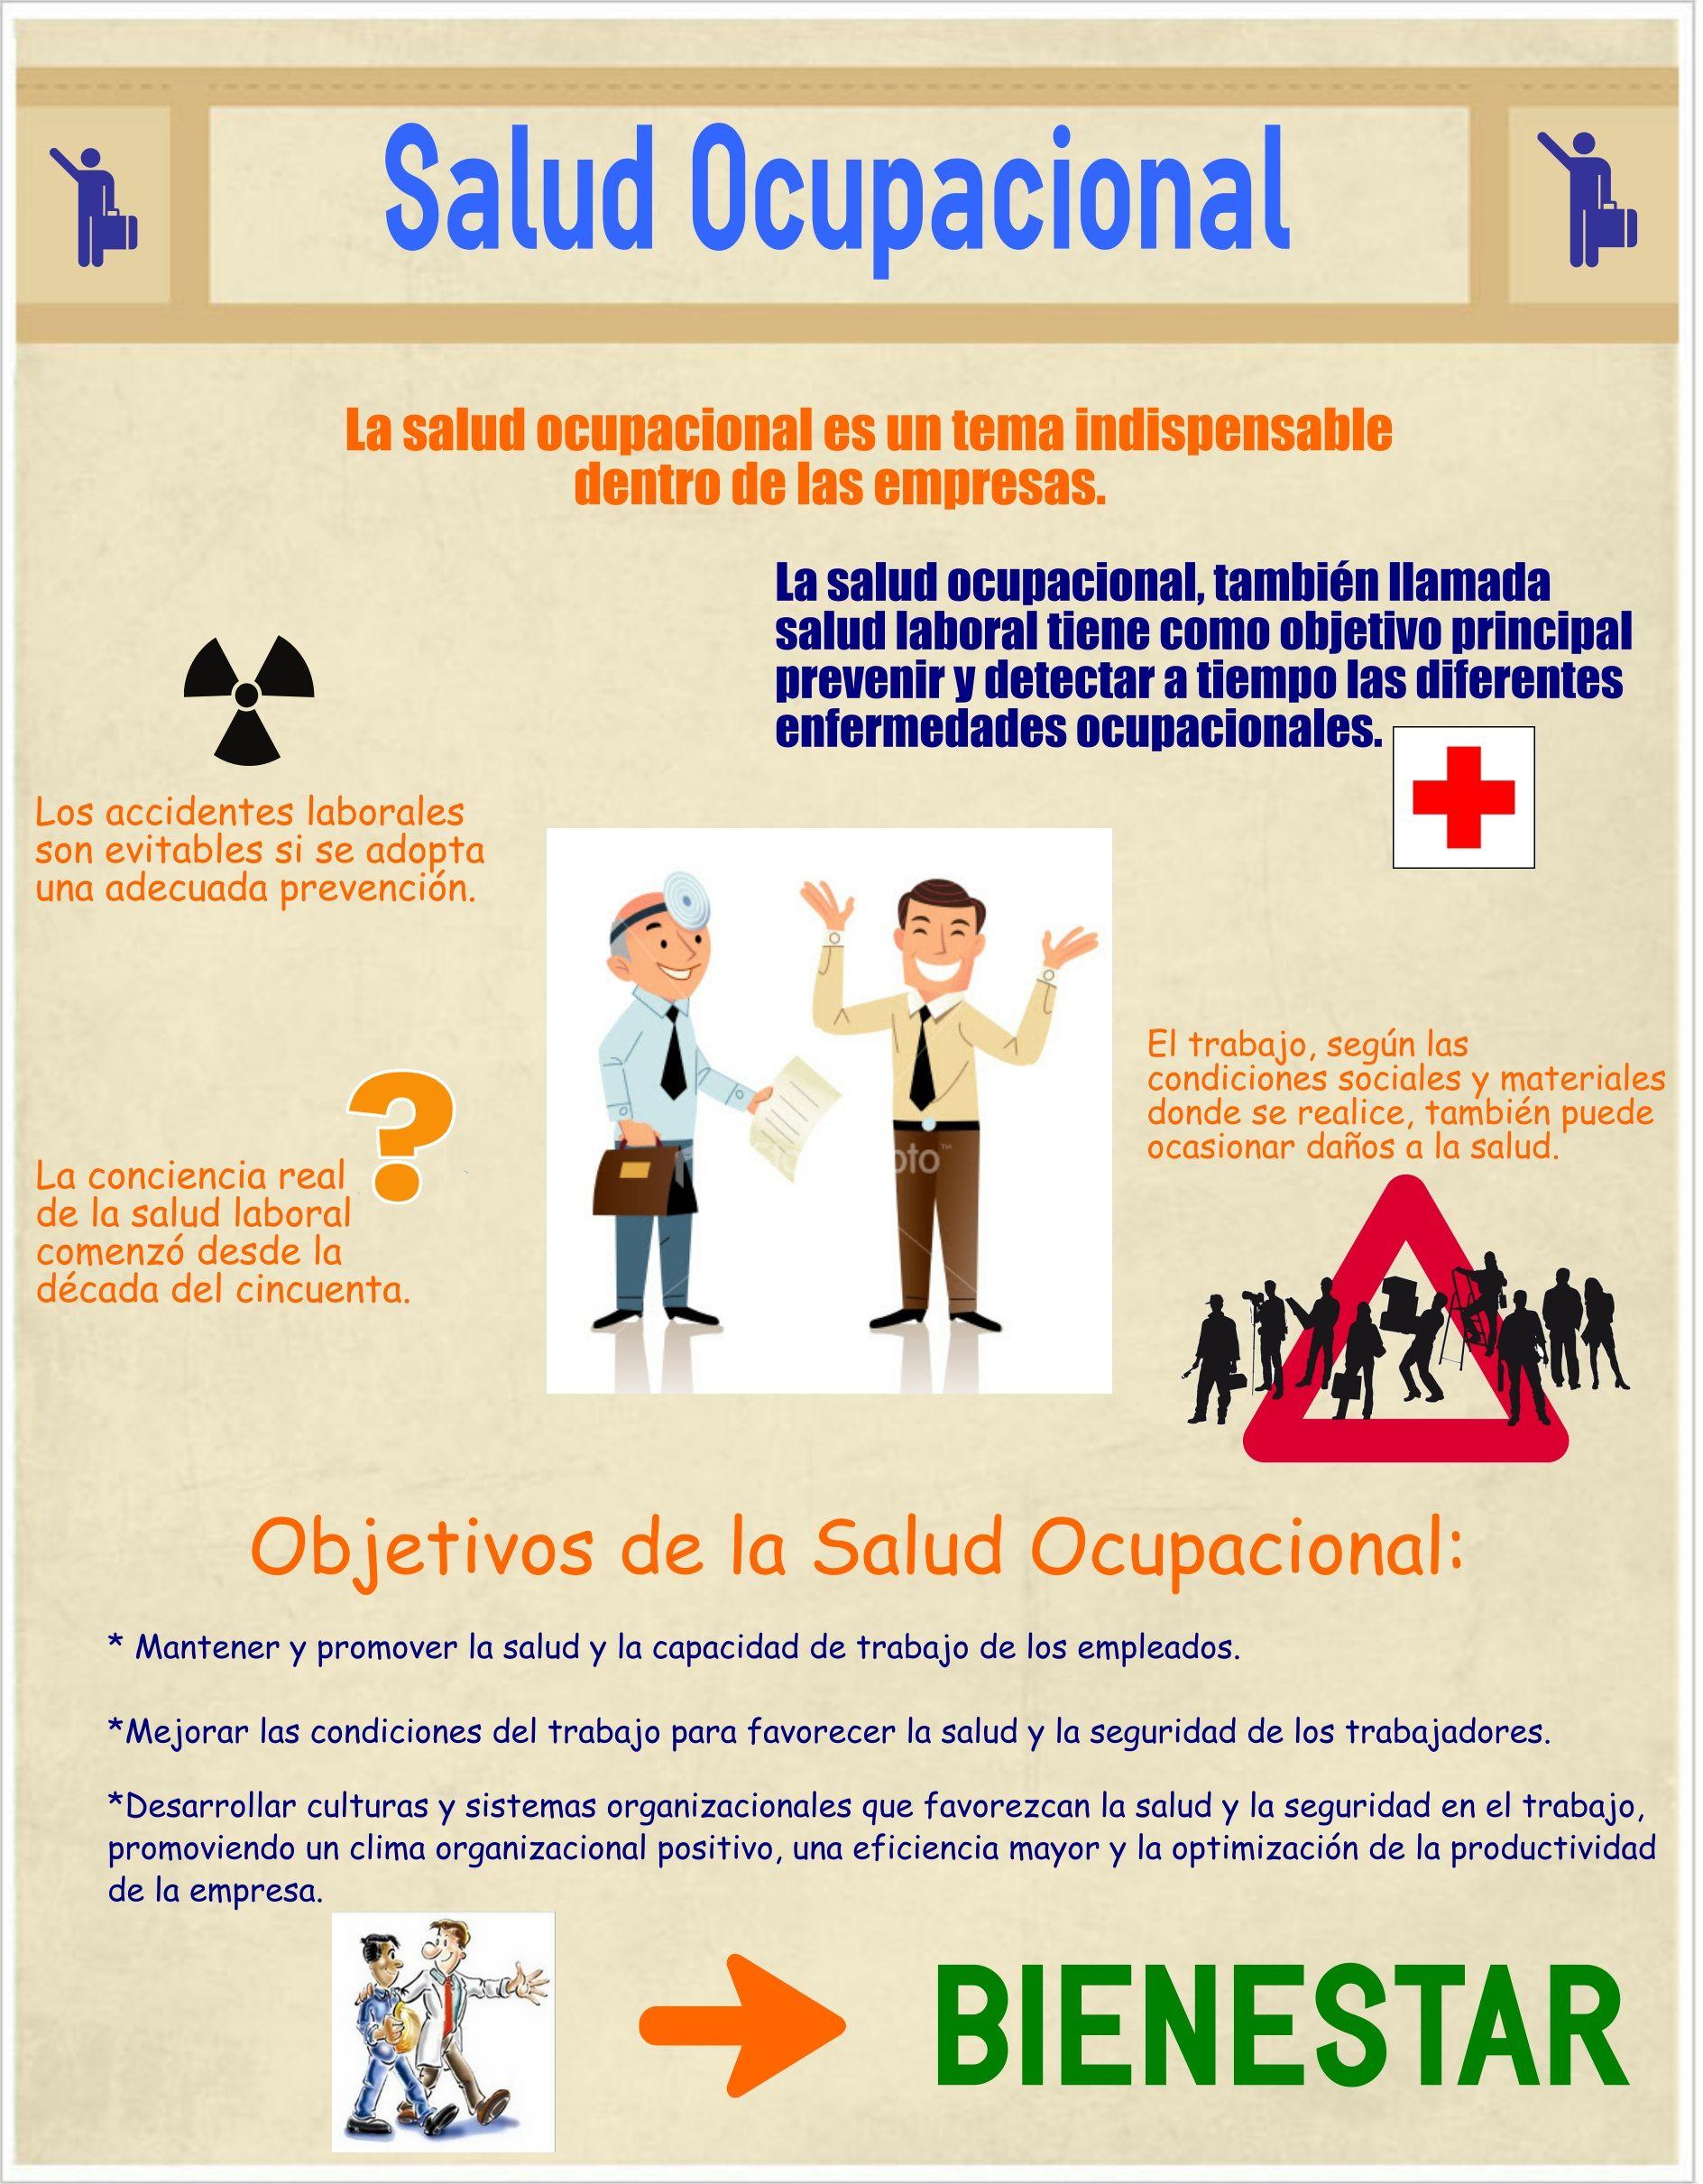 Saludlaboral1 Jpg 1888 2421 Seguridad E Higiene Mensajes De Seguridad Higiene Y Seguridad En El Trabajo